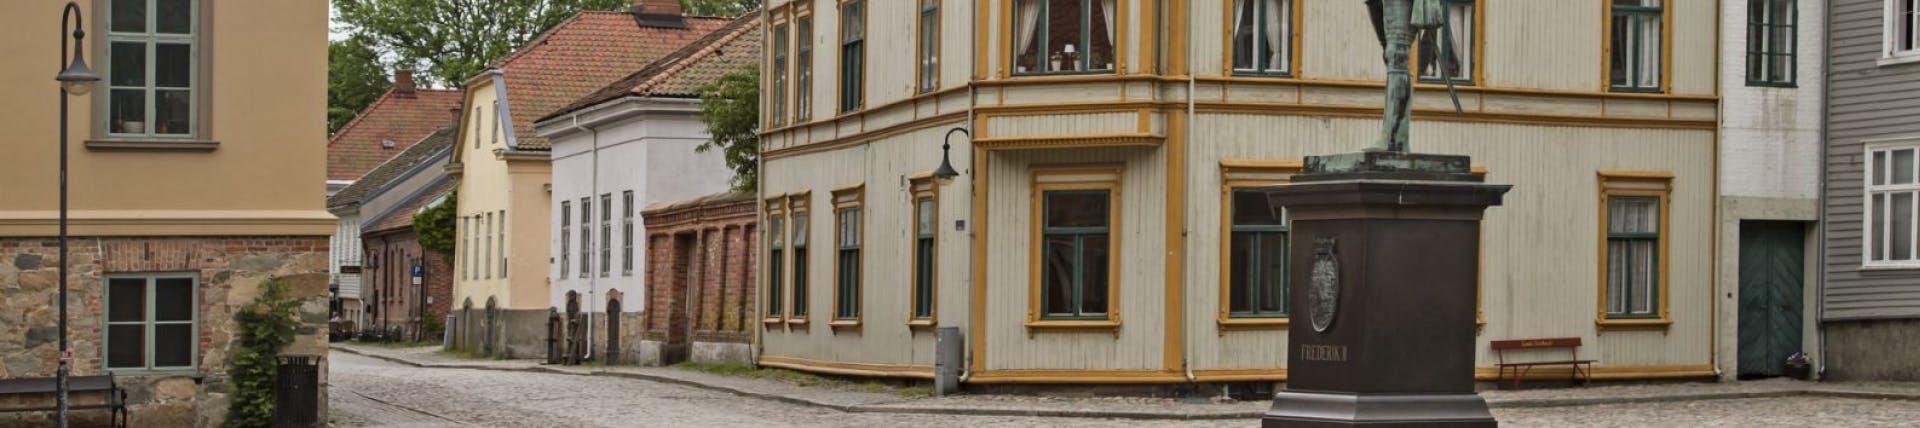 Picture of Fredrikstad